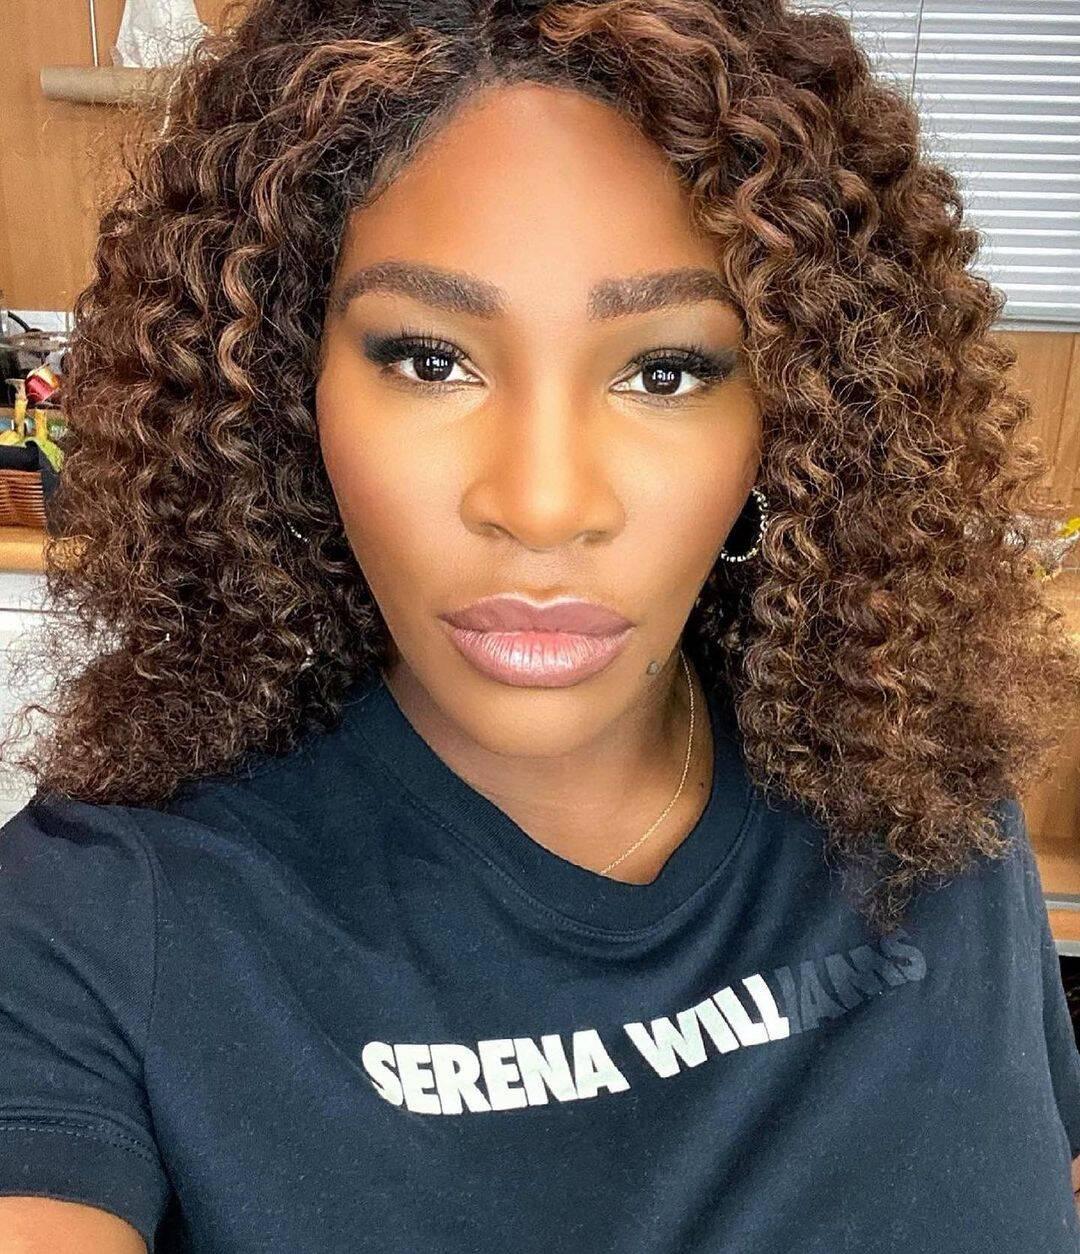 A tenista Serena Willians, recebeu comentários racistas de jornalista (Foto: Instagram)